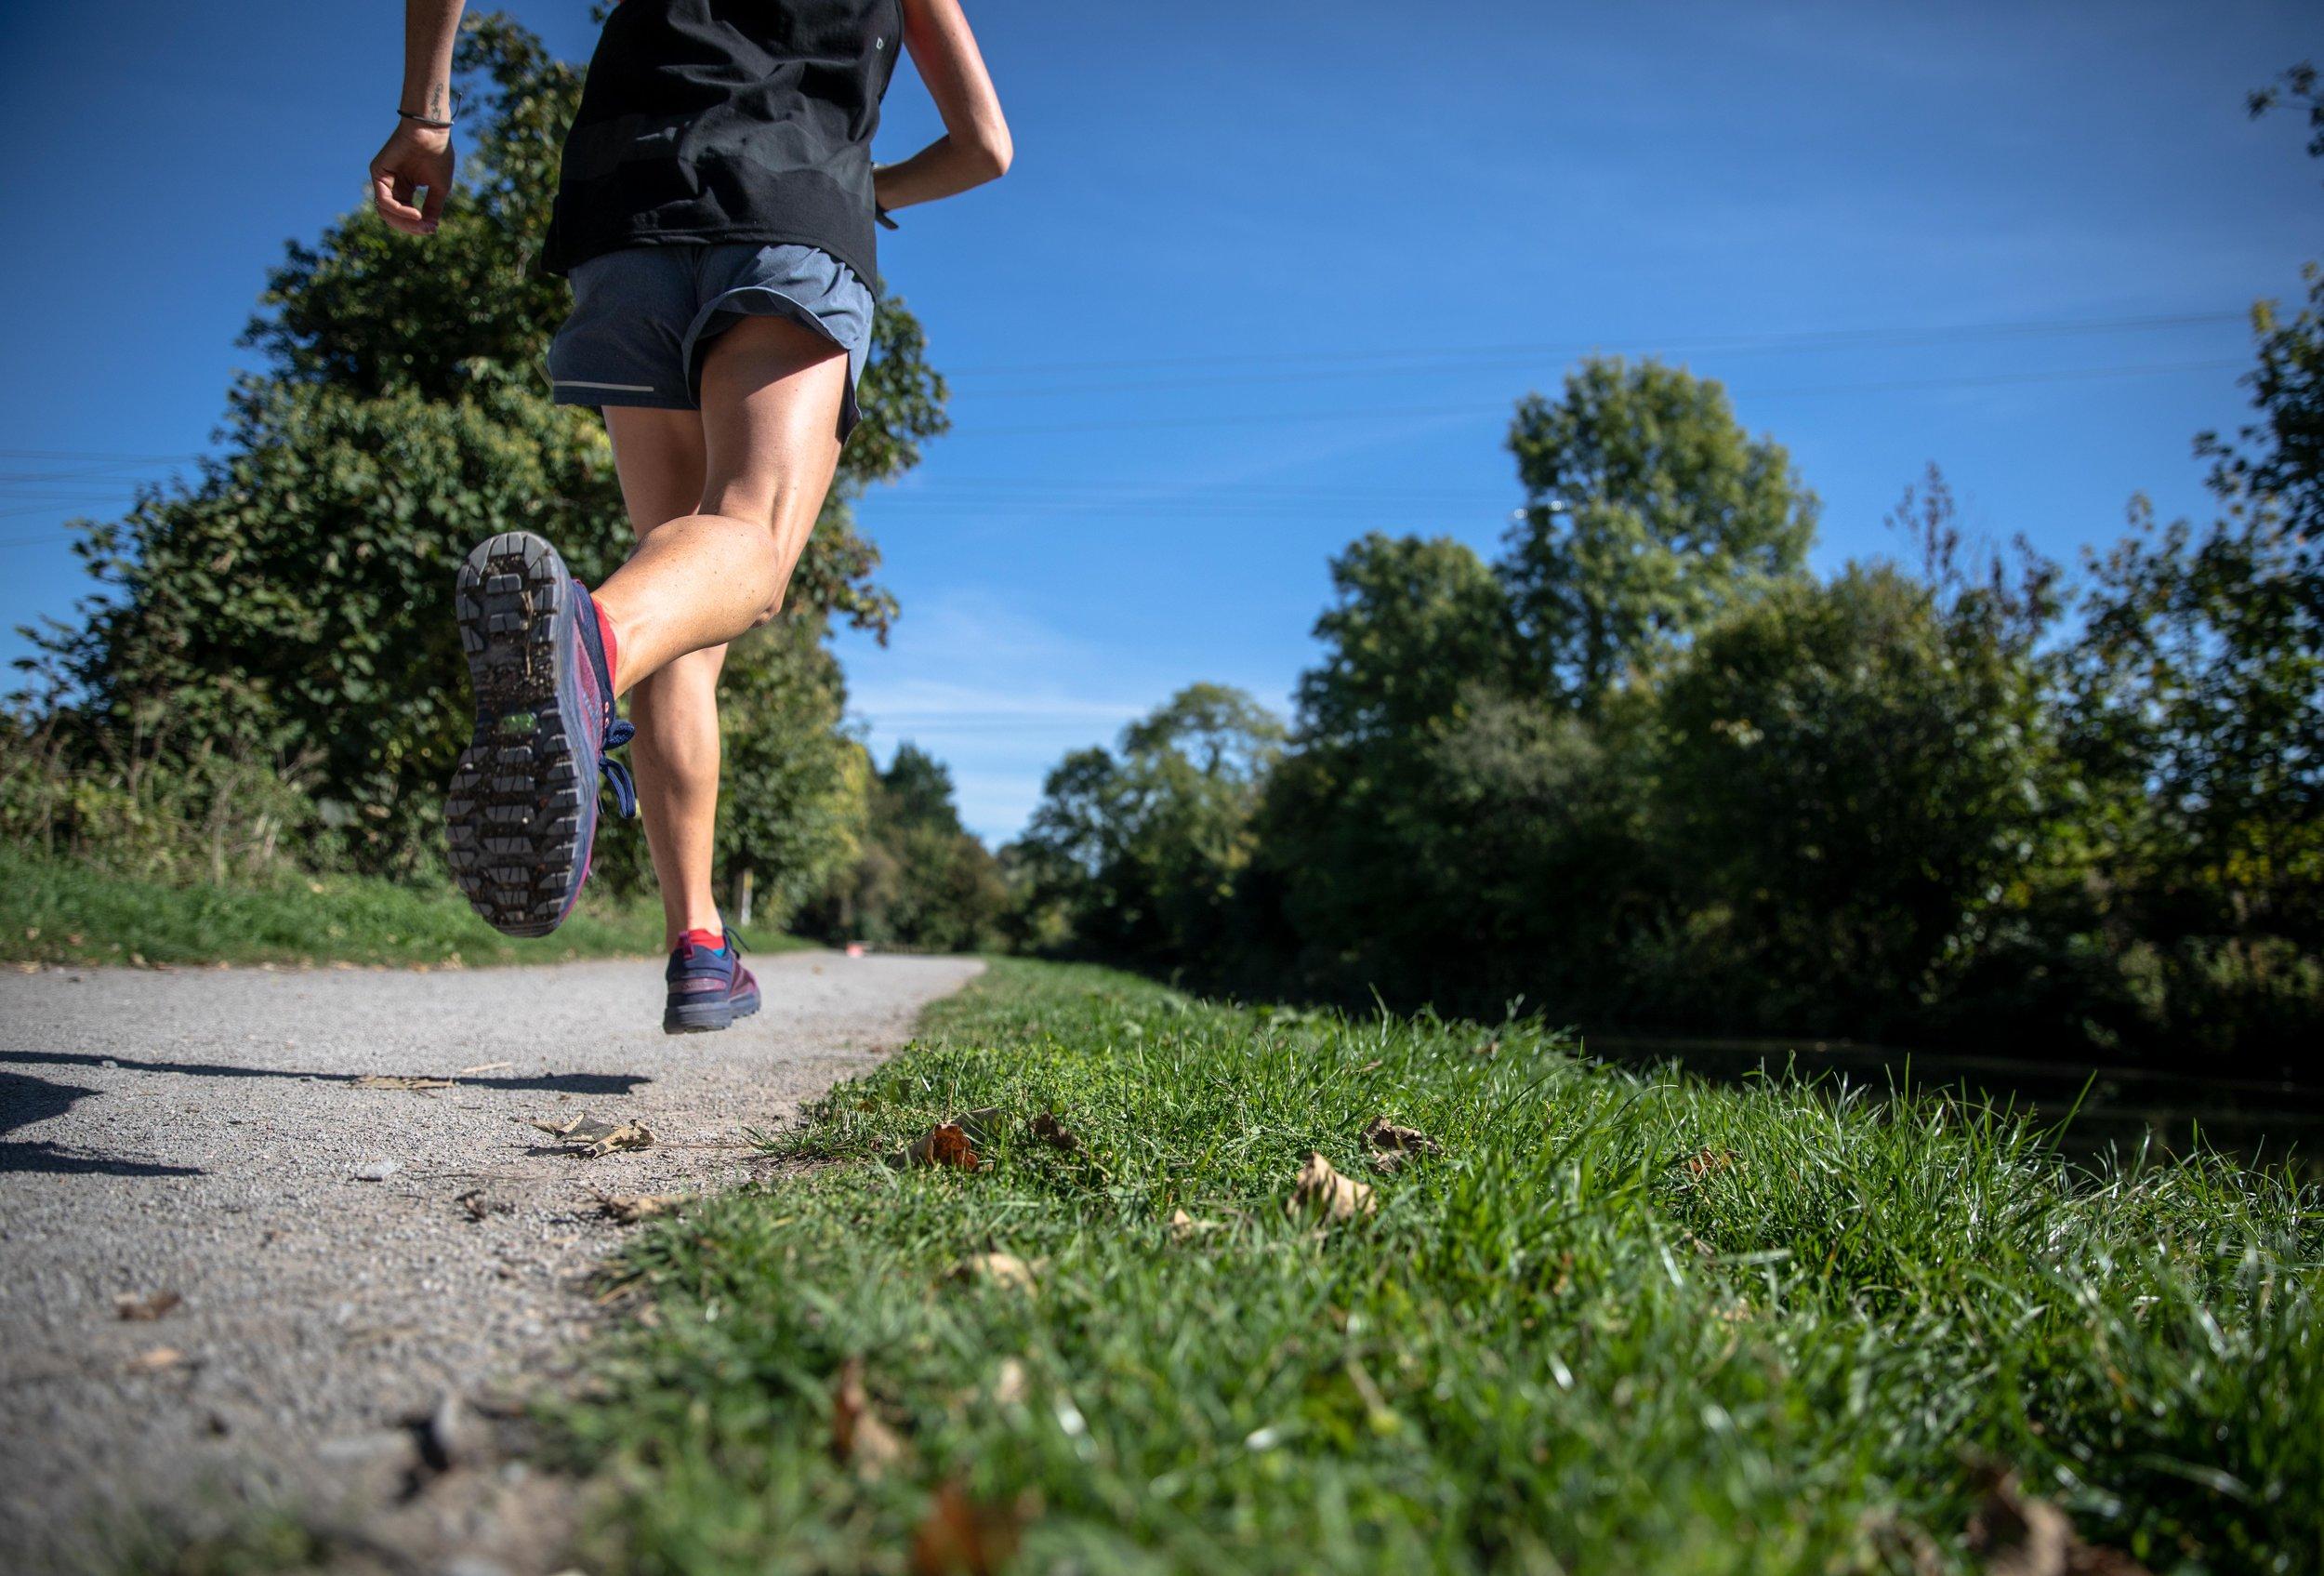 Running (6-8mph) = Vigorous Intensity